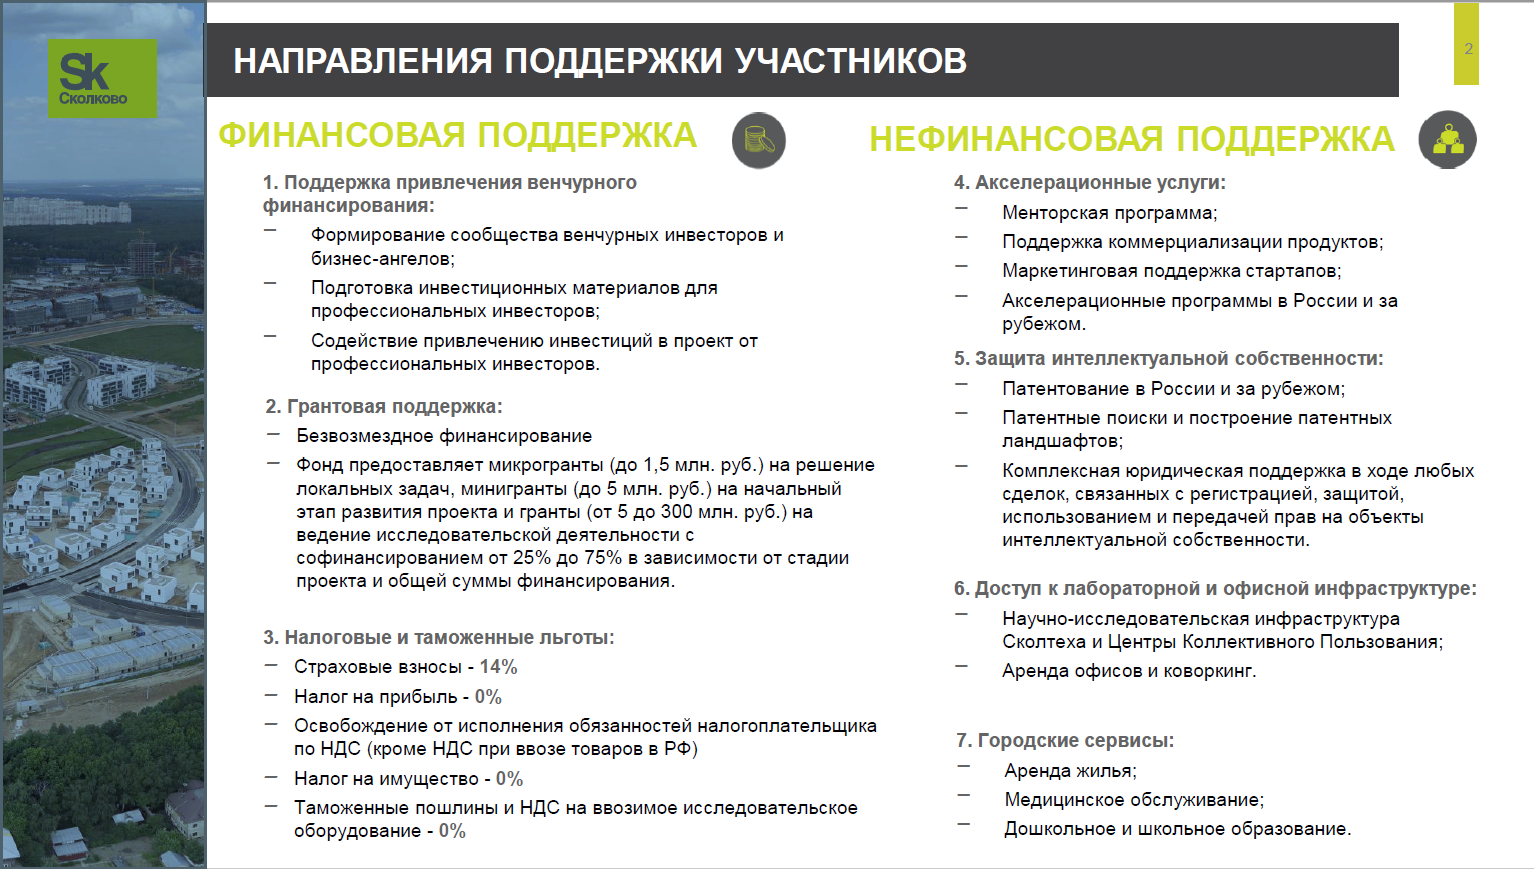 Поддержка участников Сколково